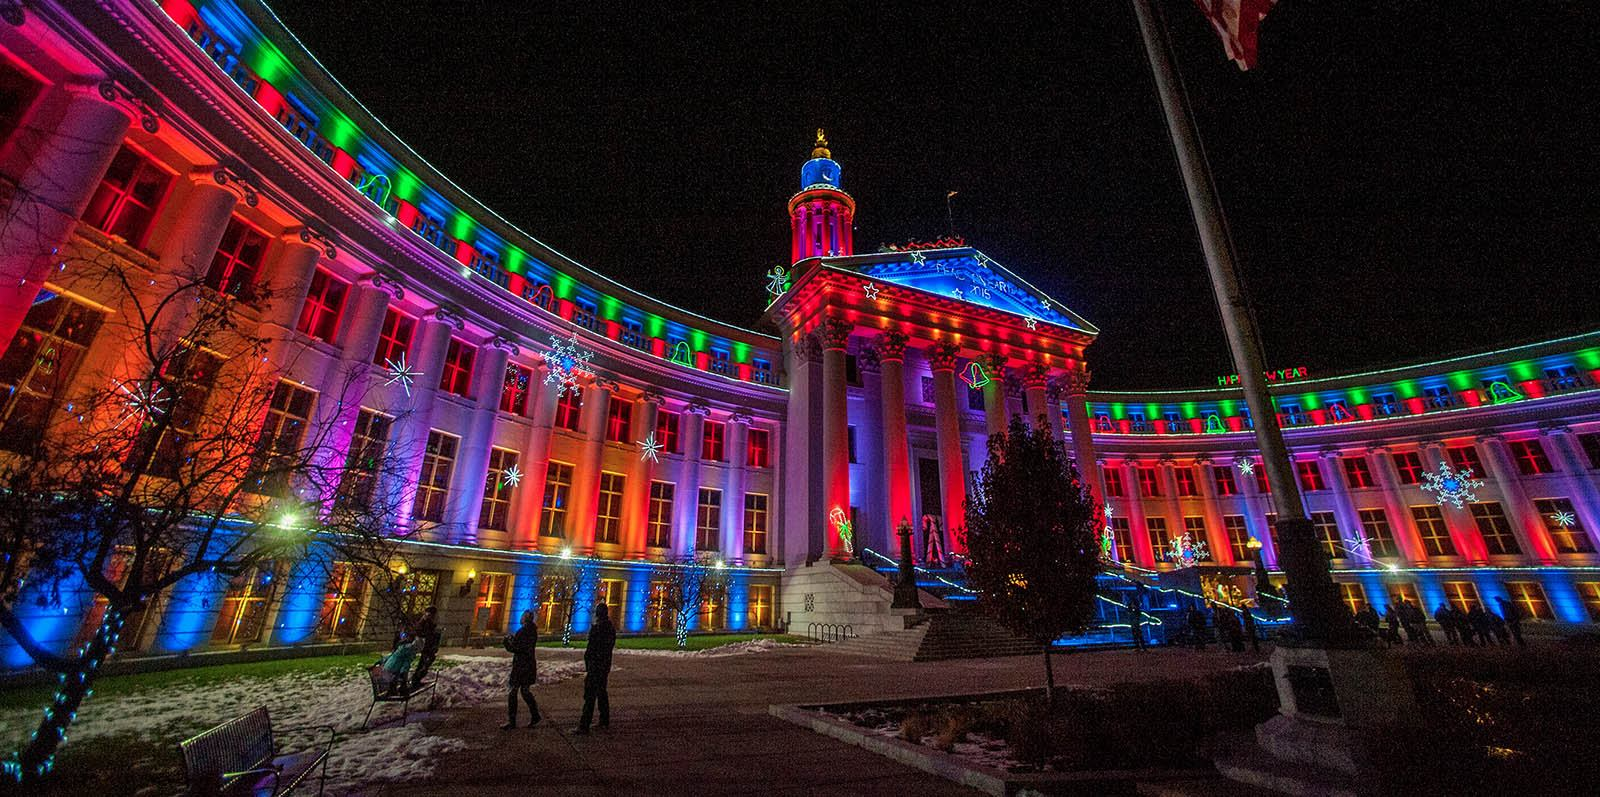 2018 9news Parade Of Lights Downtown Denver Partnership